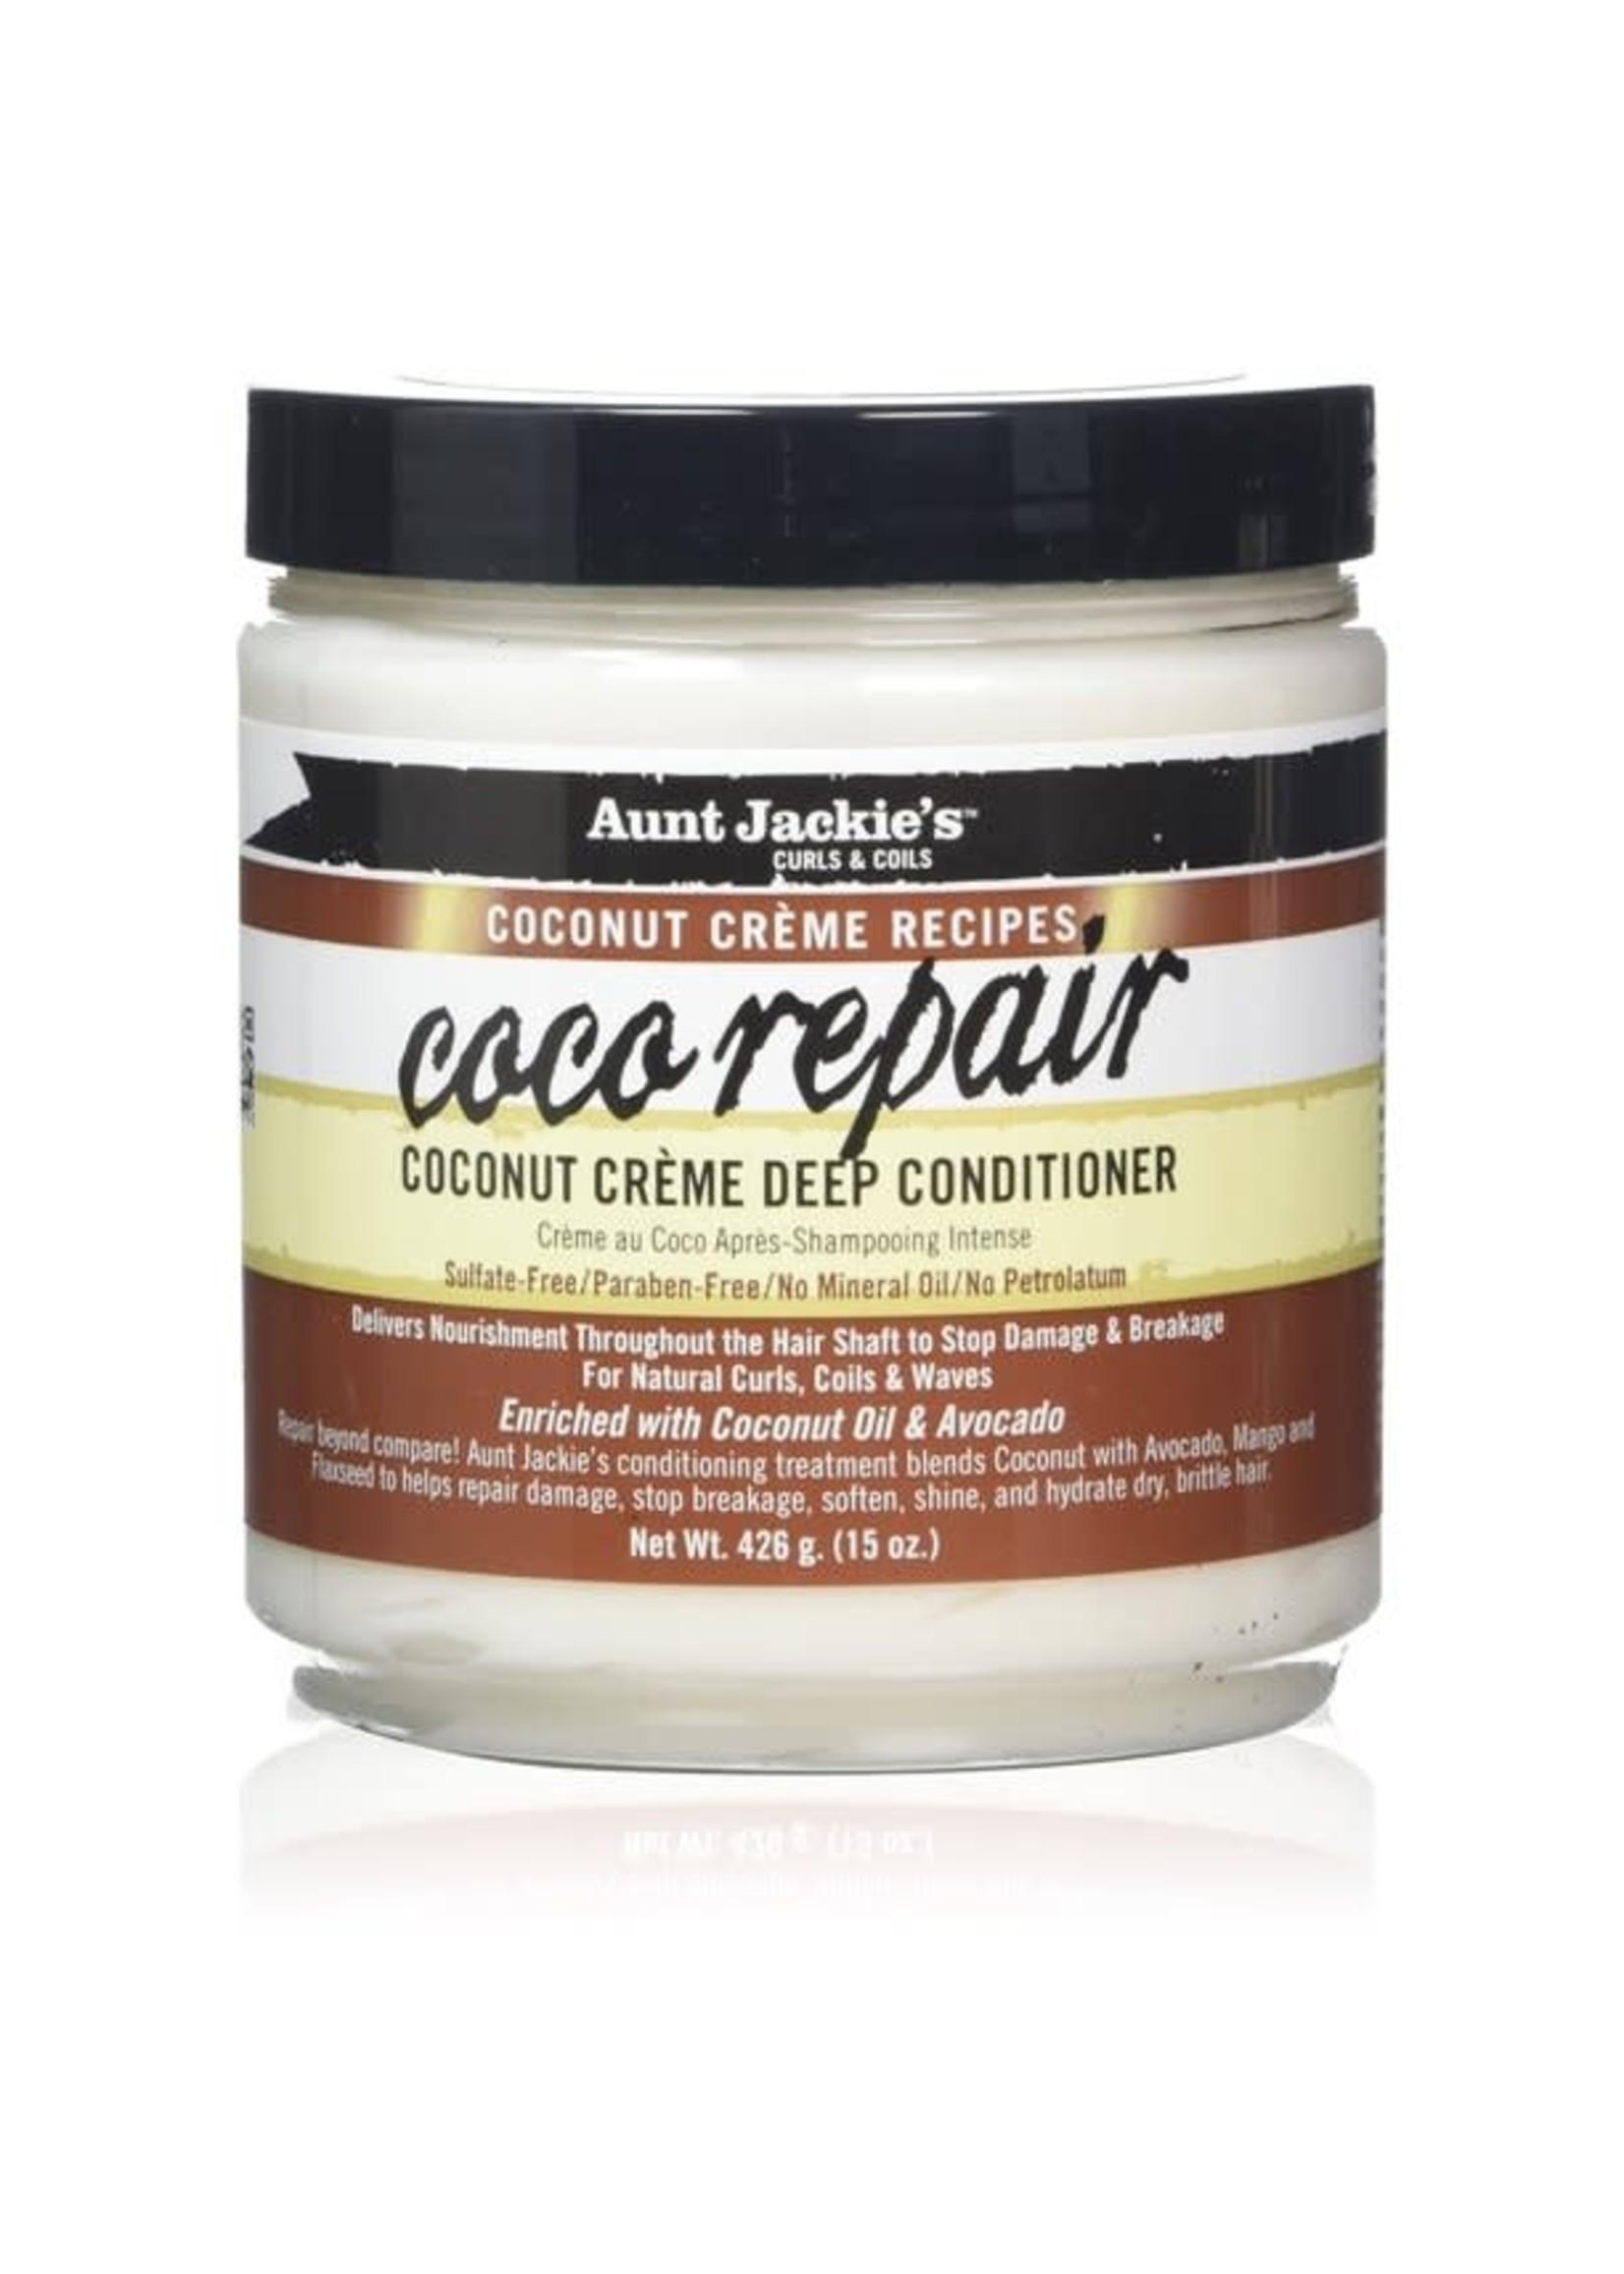 Aunt Jackie's Aunt Jackie's Coconut Creme Repair Deep